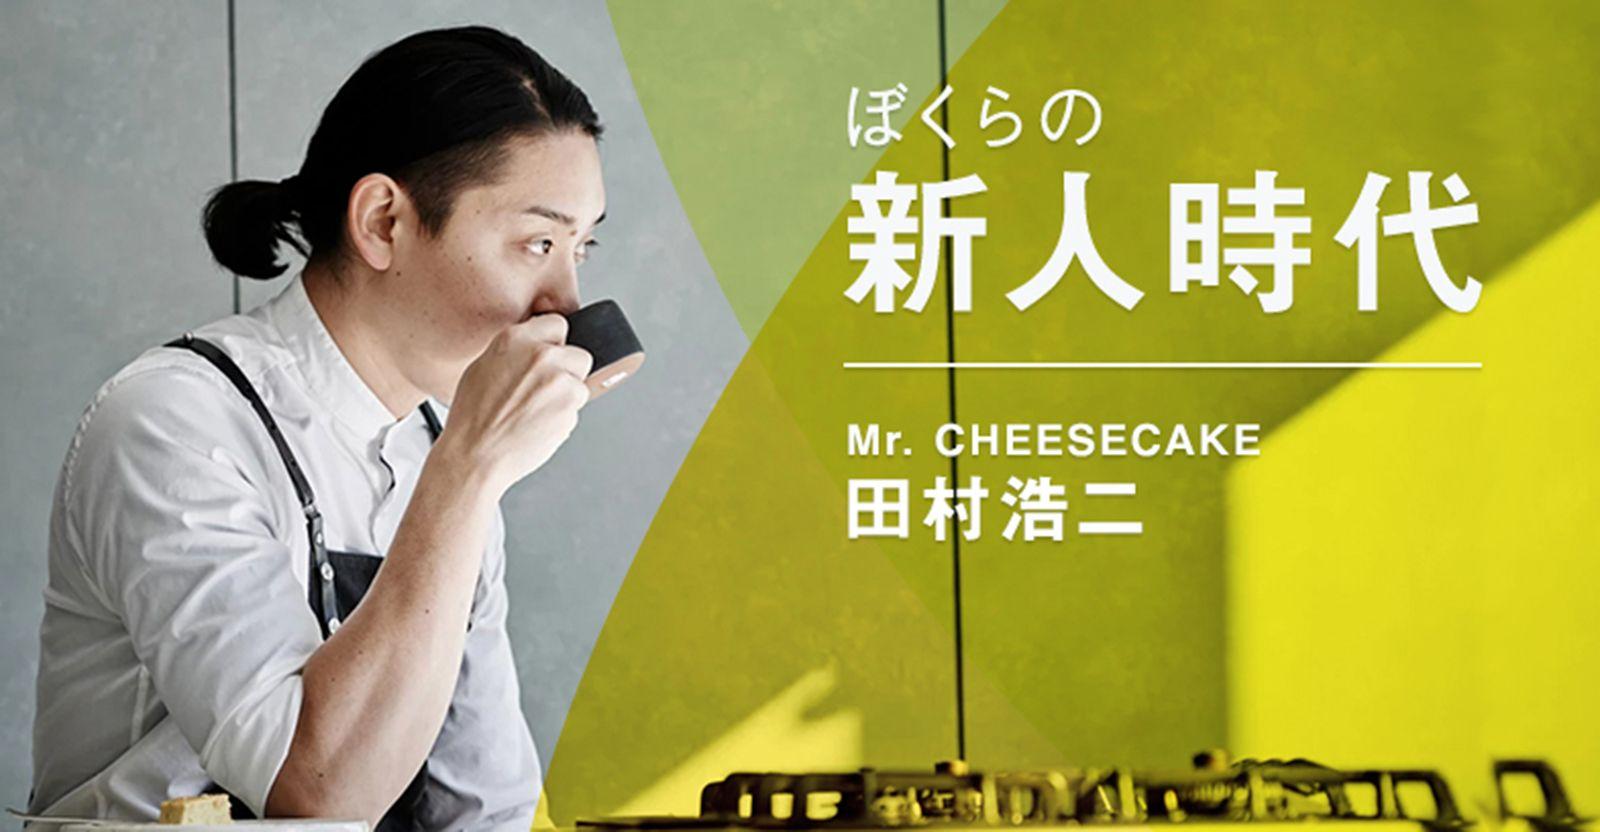 Mr. CHEESECAKE 田村浩二の挑戦。32歳でシェフ卒業、料理の世界にSNSで風穴を。